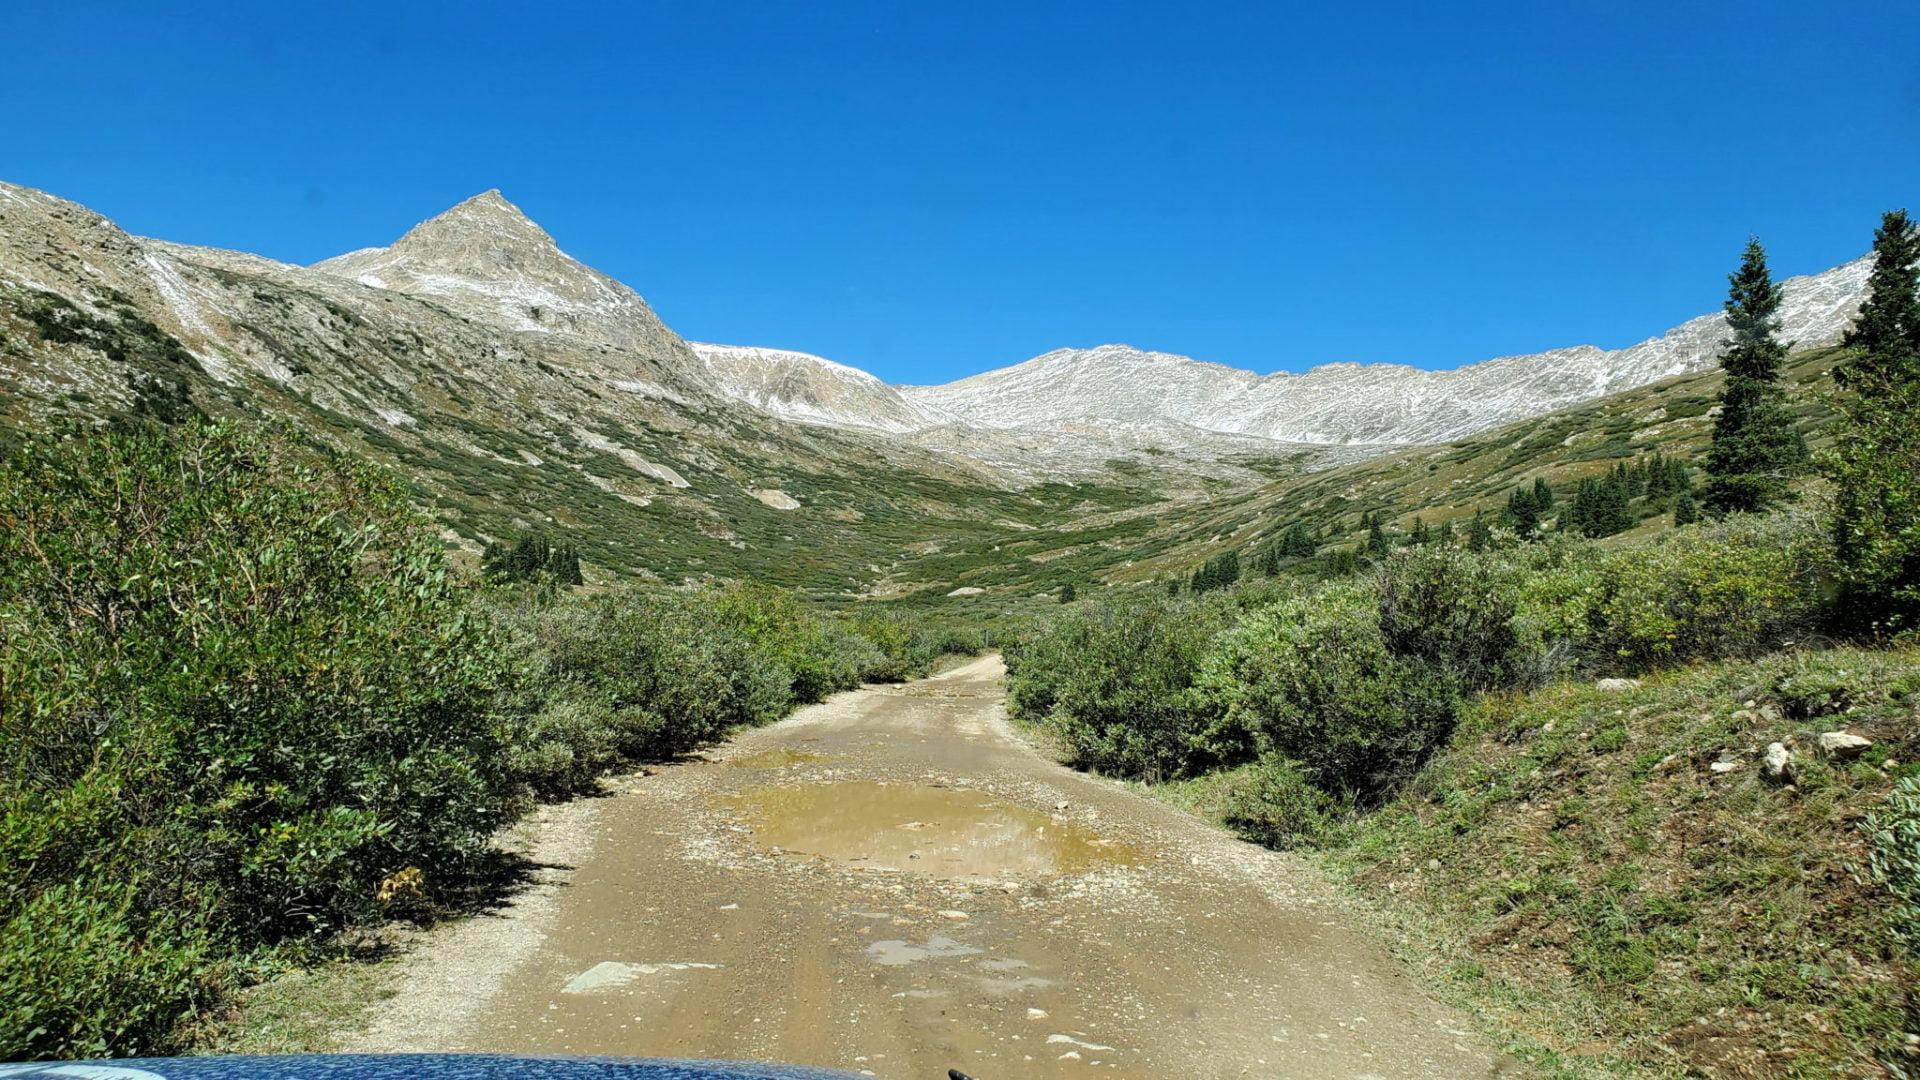 The trail at treeline